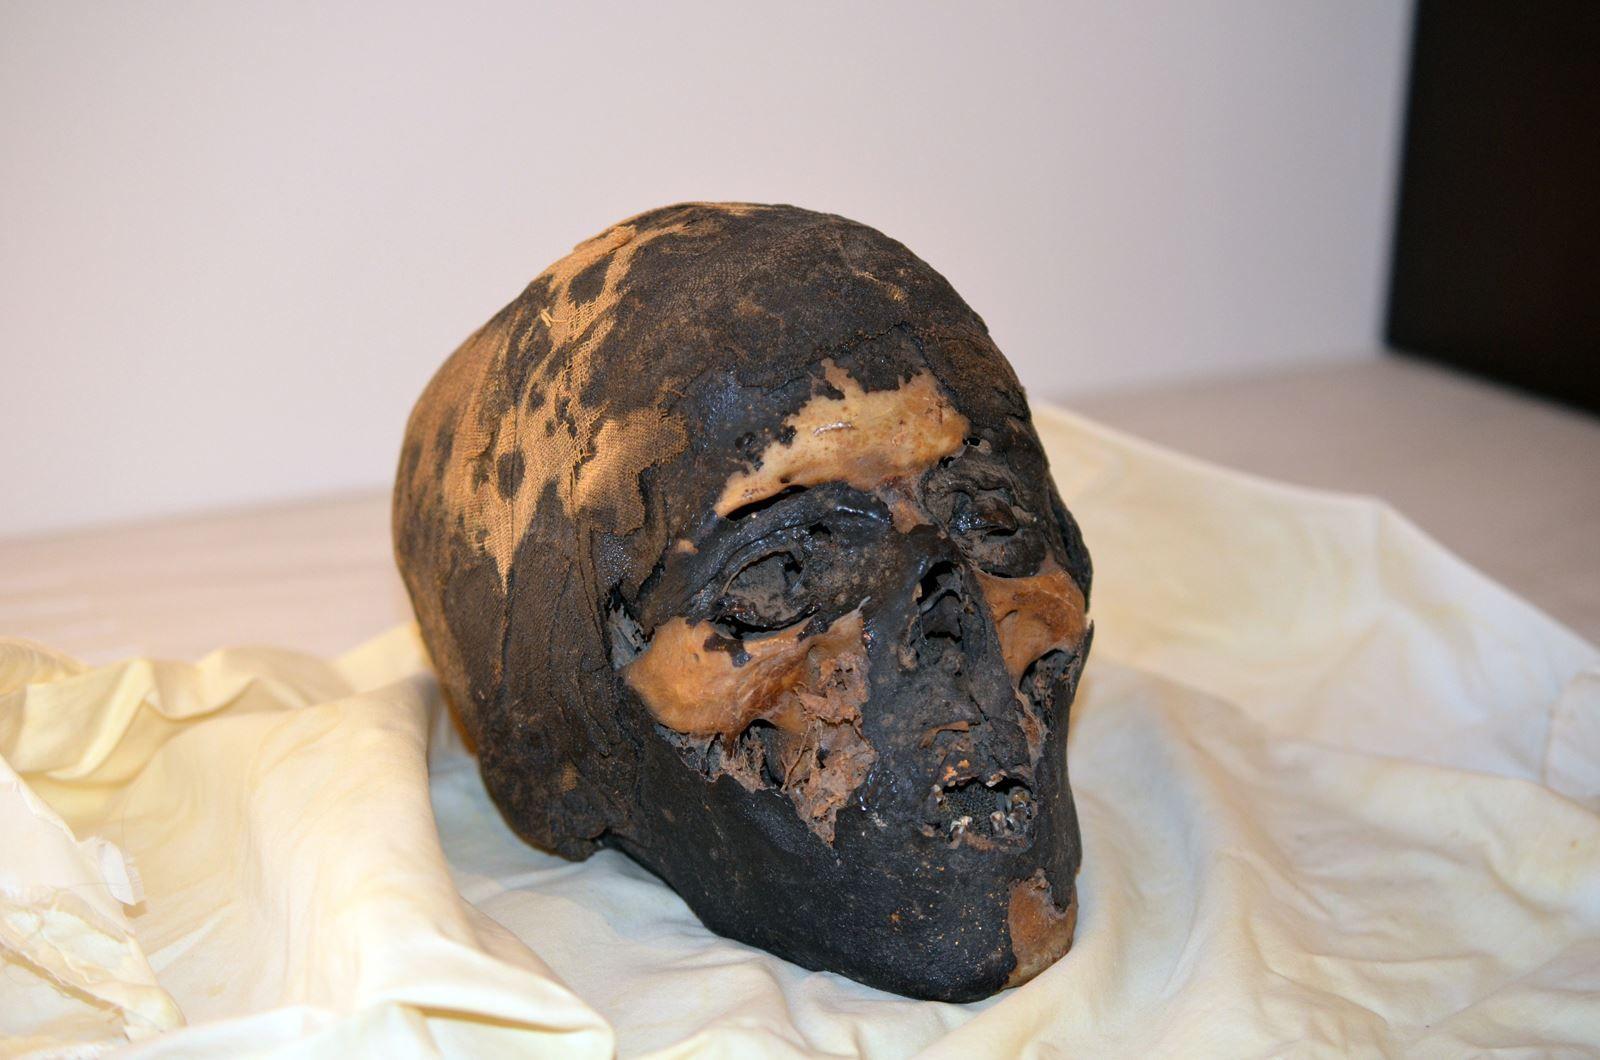 01_03_Mummified_Skull